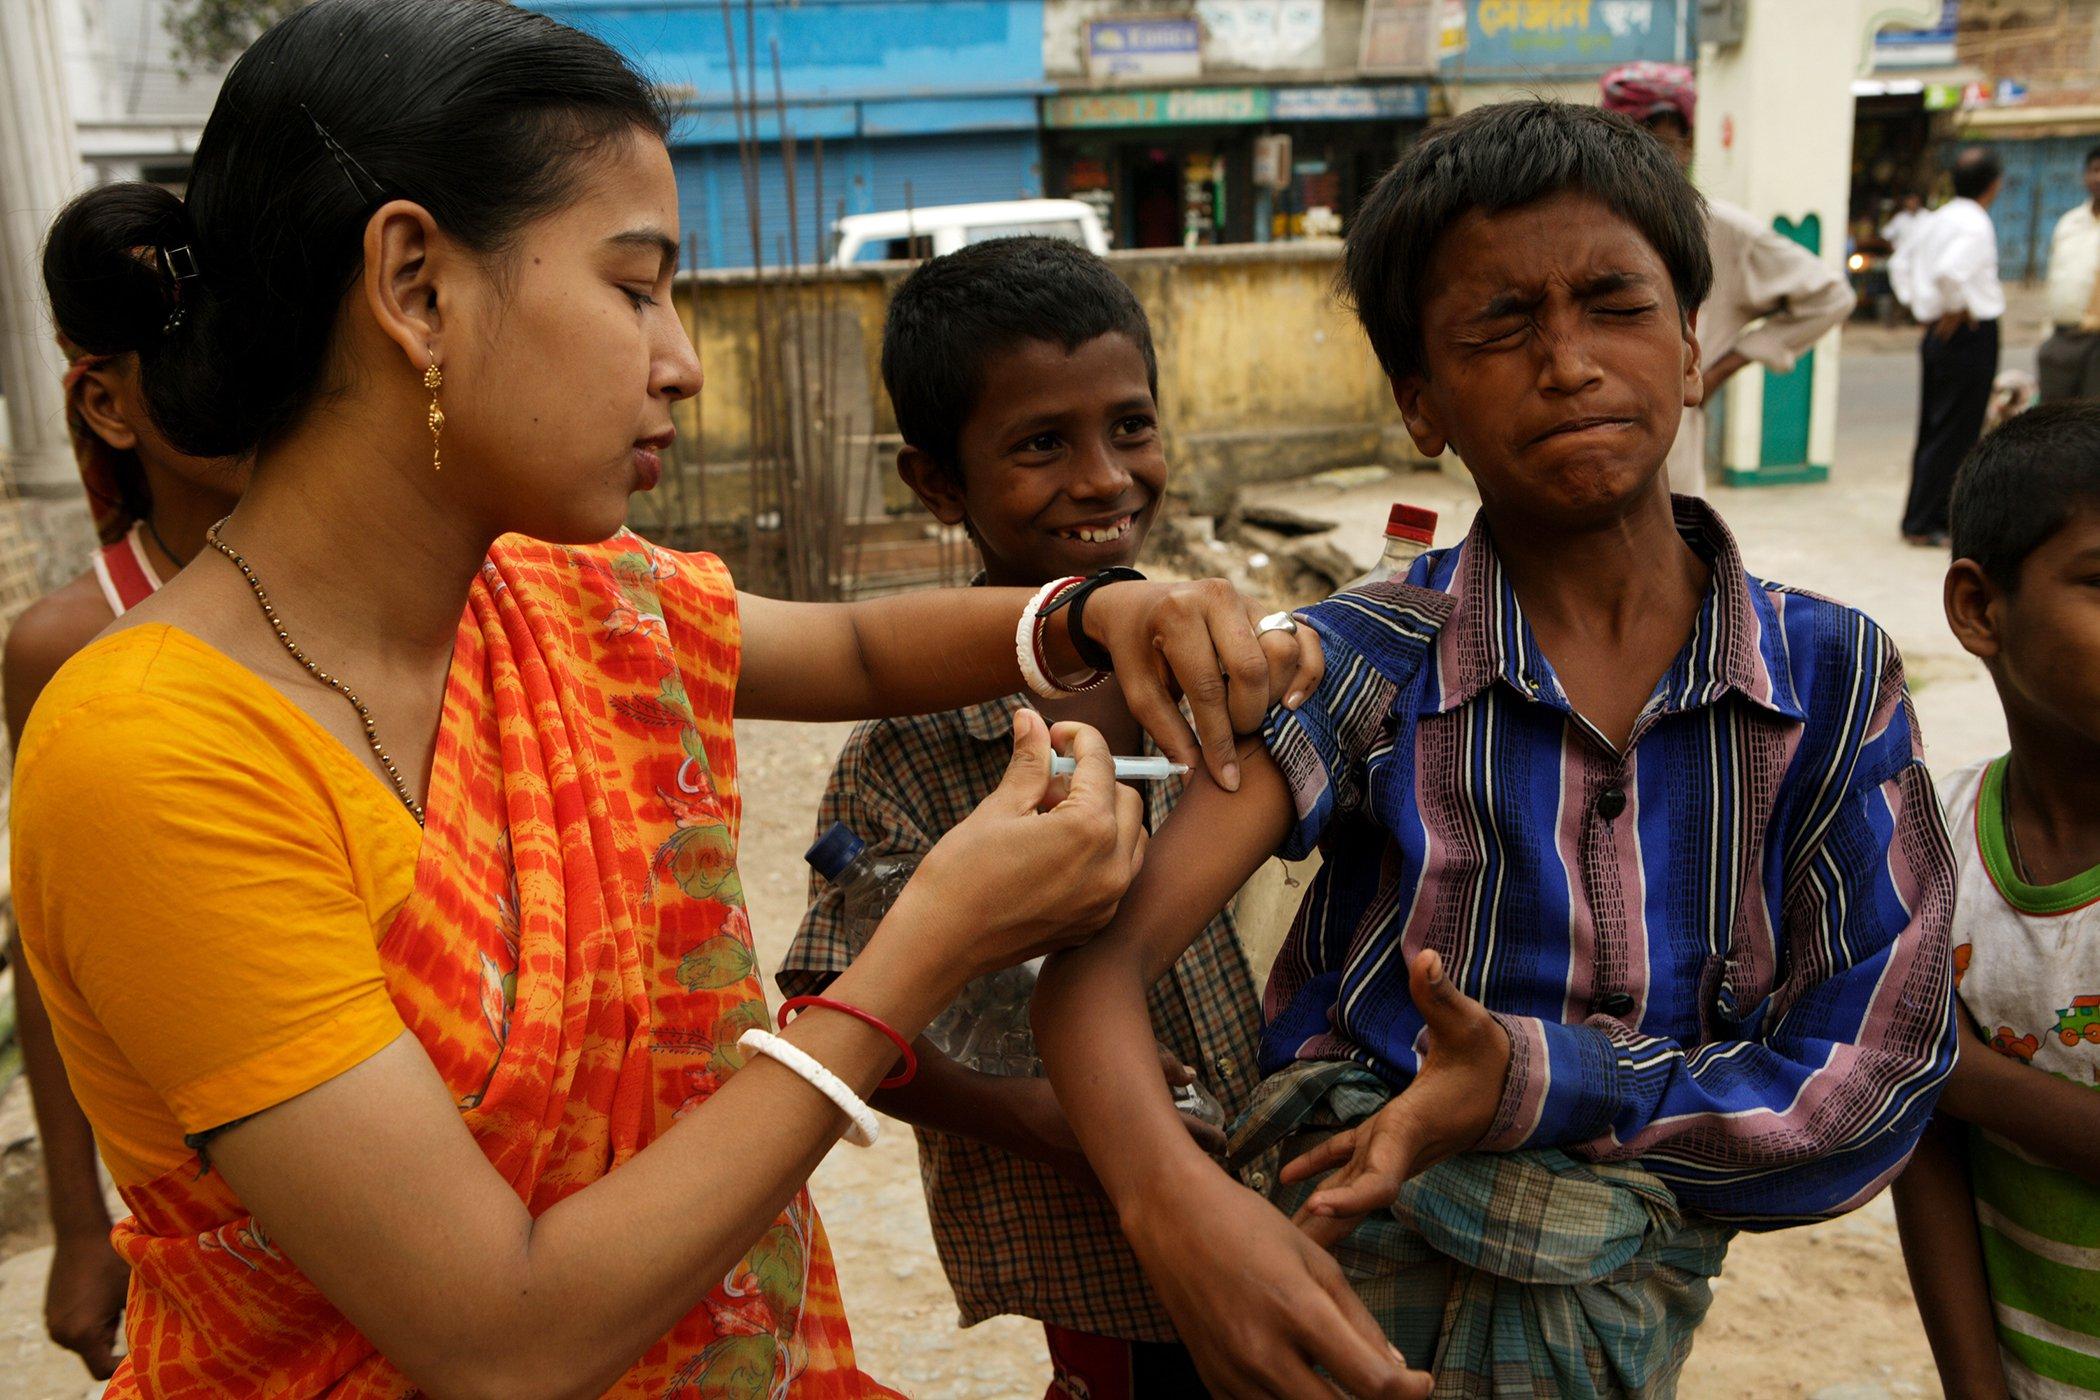 UNICEF_Vaccinations-Around-The-World_007.jpg